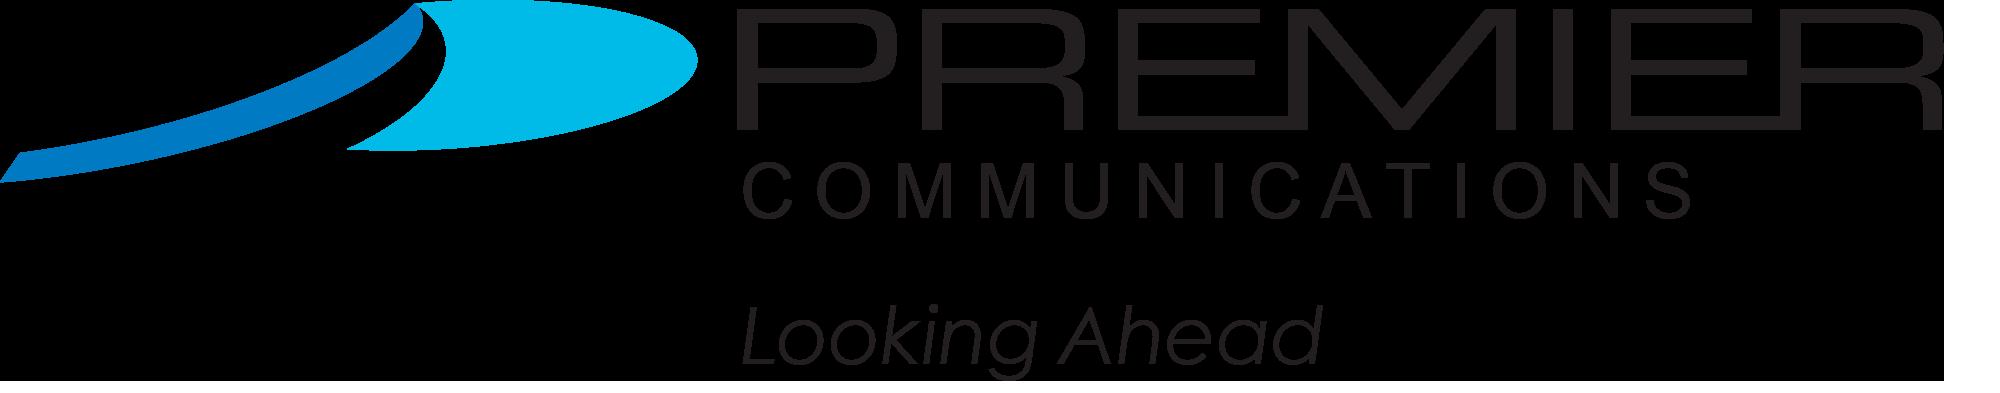 Premier-logowithtagline